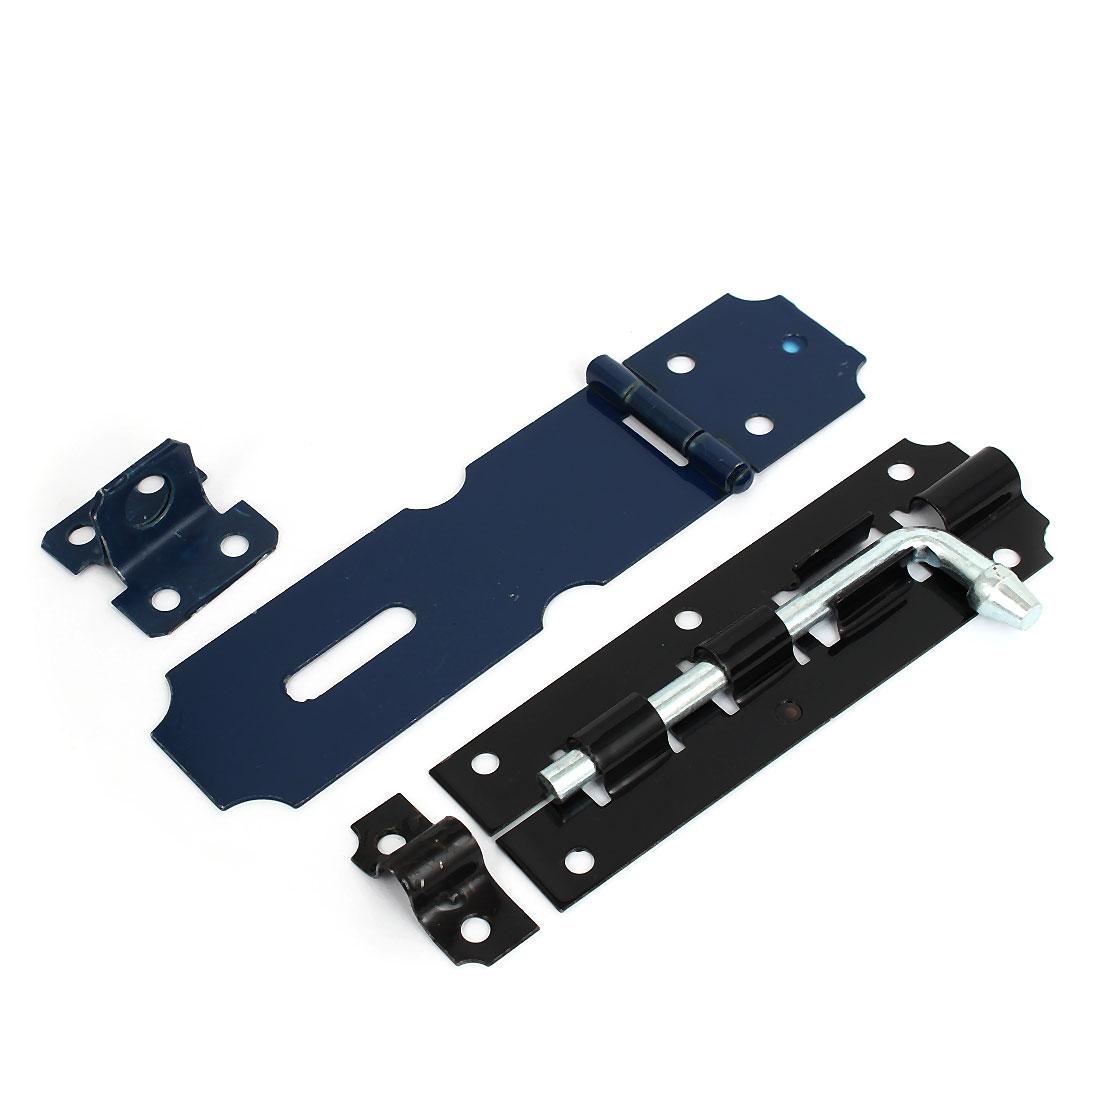 2 Set Black Blue Metal Door Hardware Lock Slide Barrel Bolt + Hasp Staple